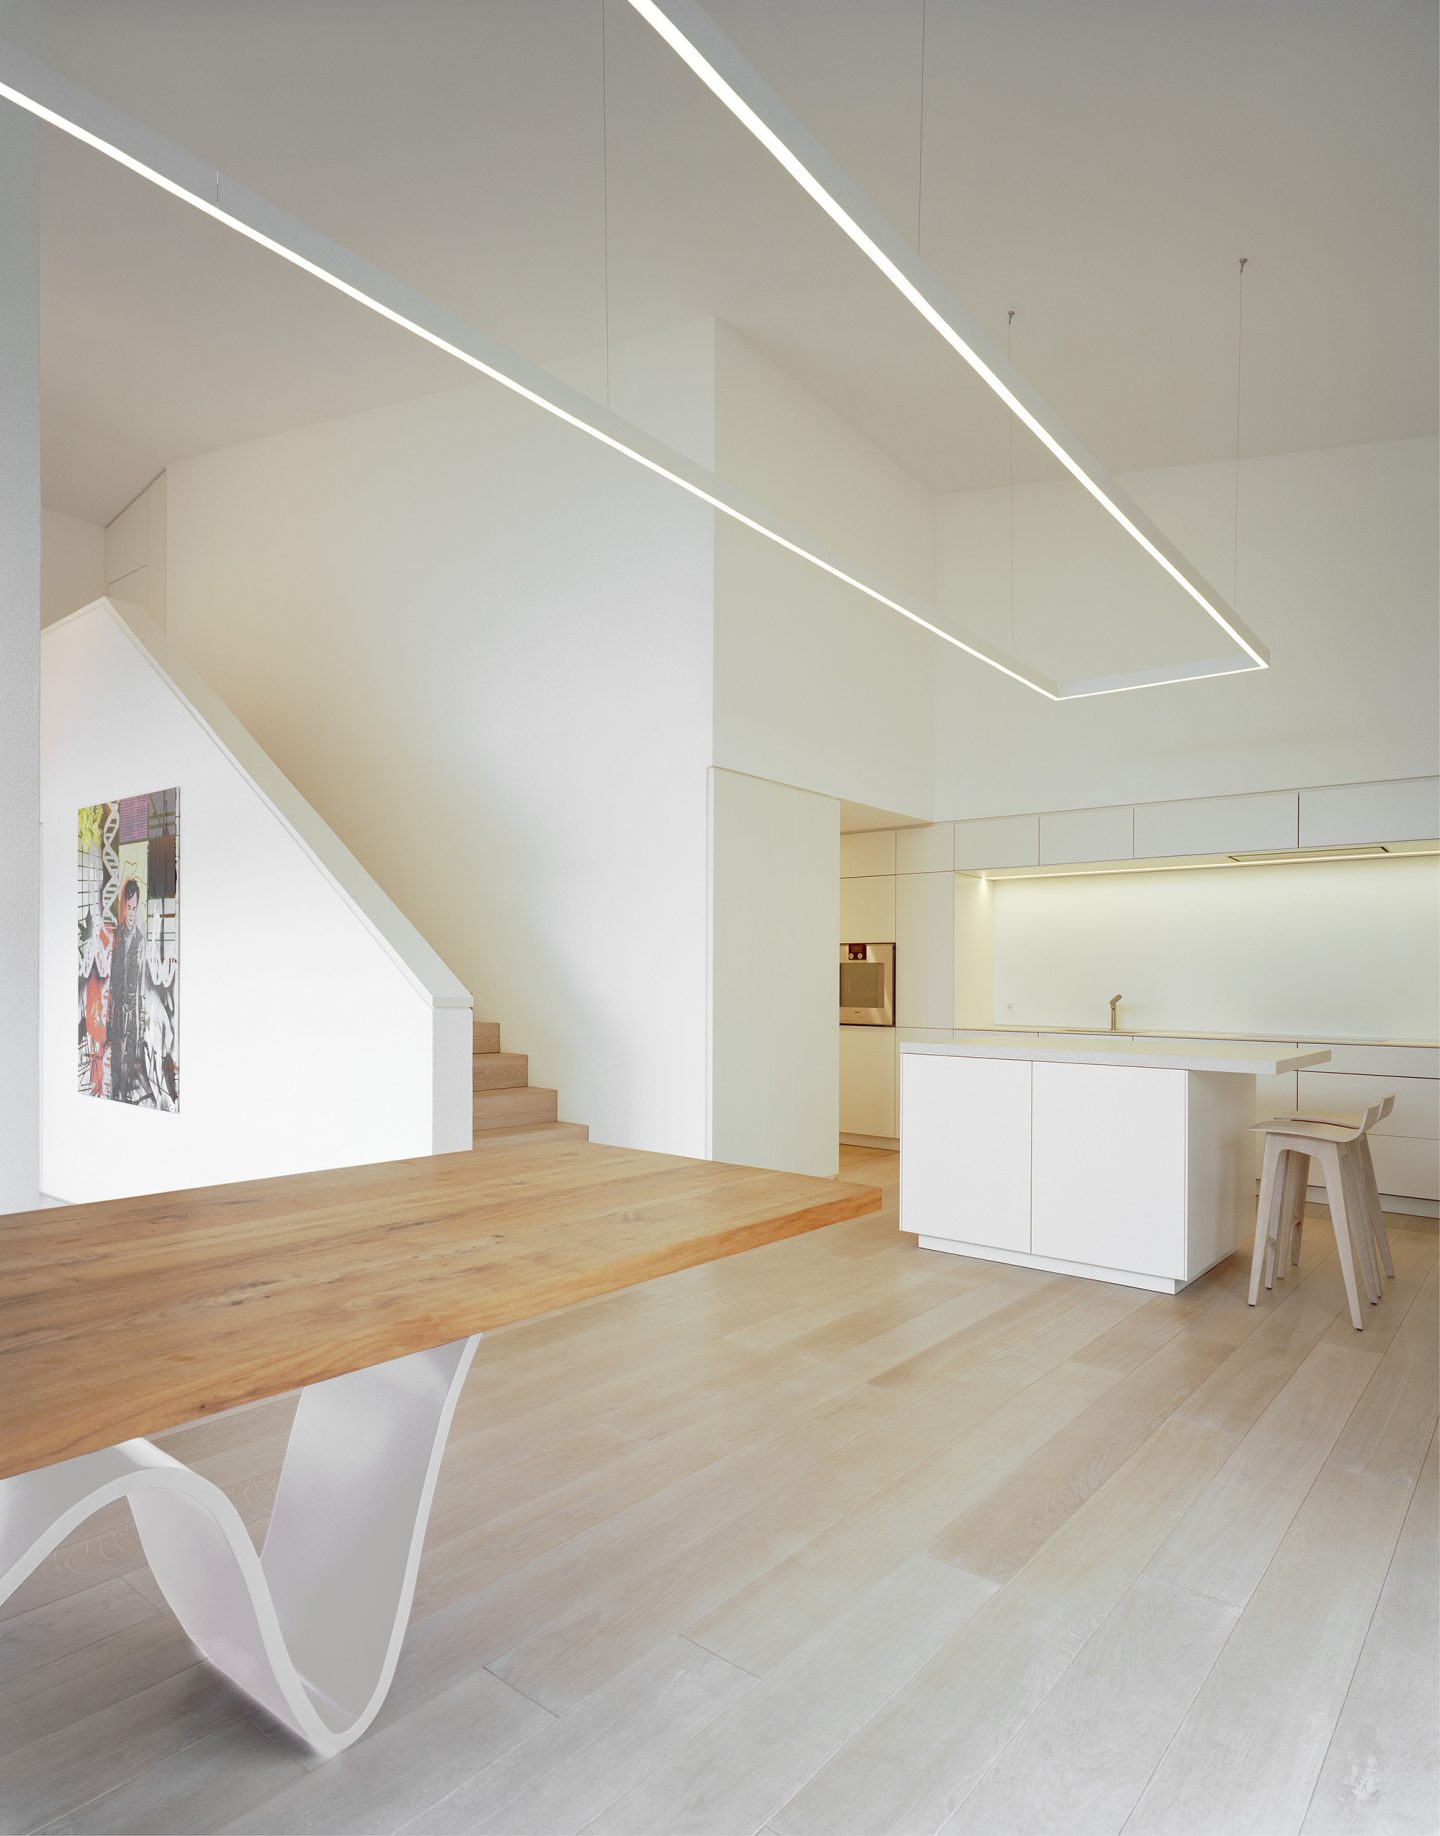 IGNANT-Architecture-Steimle-Architekten-S3-City-Villa-03